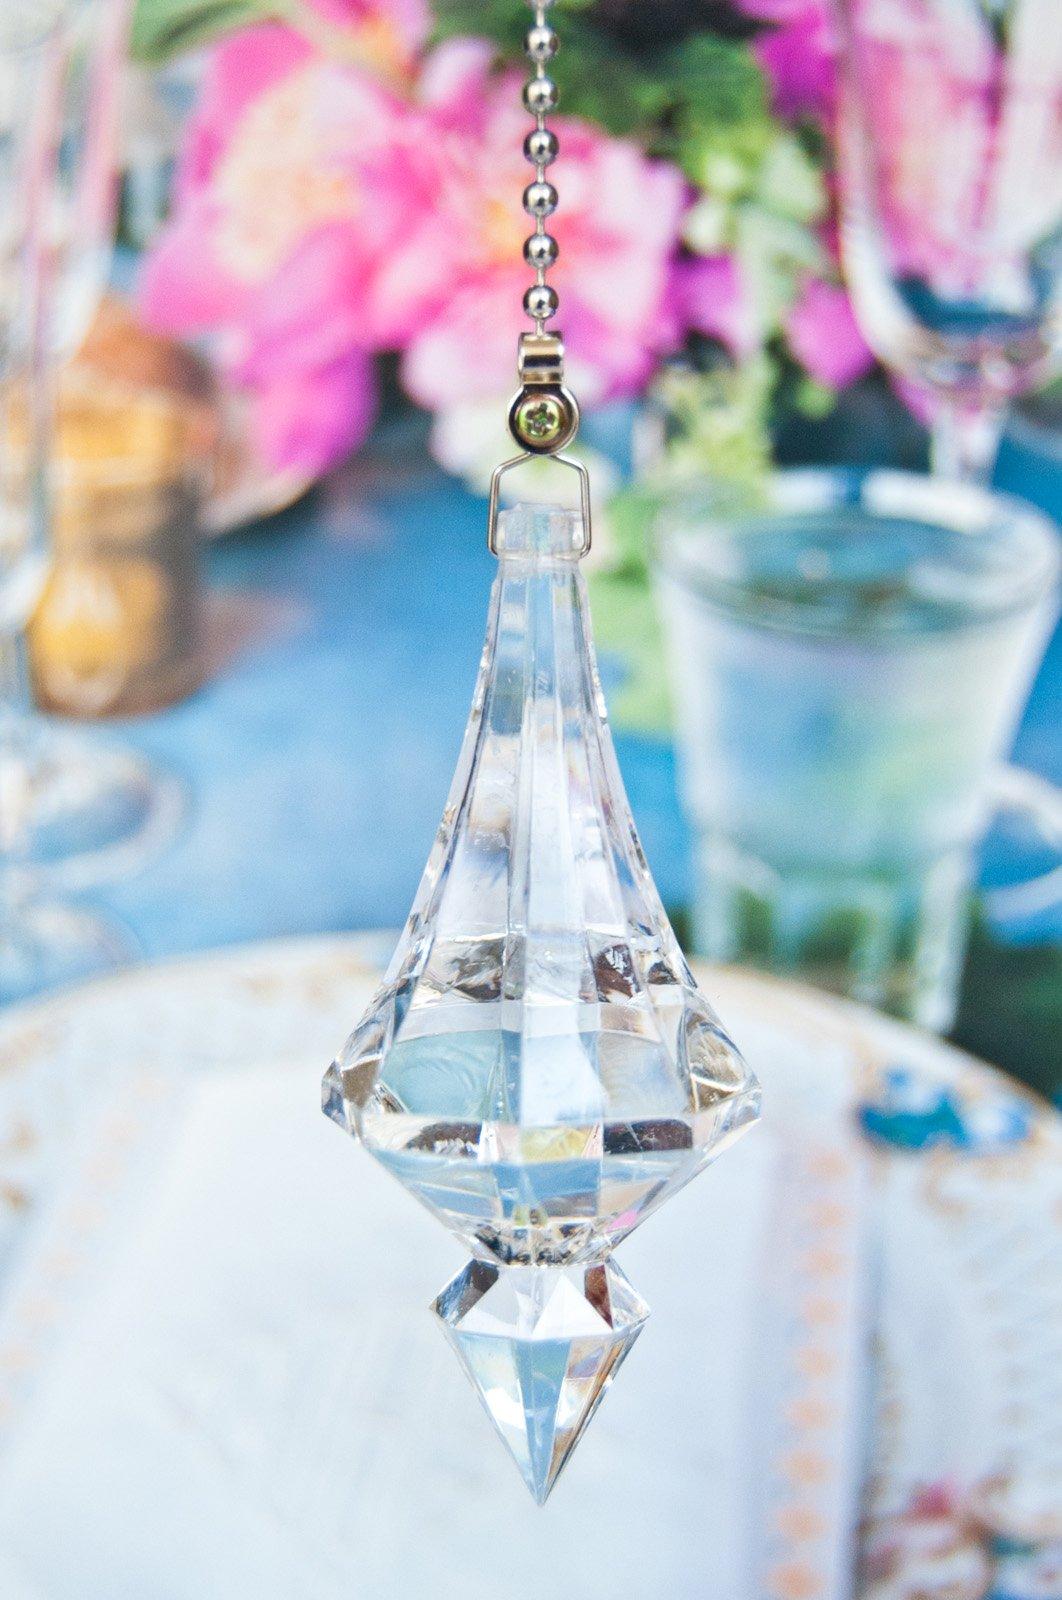 2 of Acrylic Crystal Spear Ceiling Lighting Fan Pulls-clear